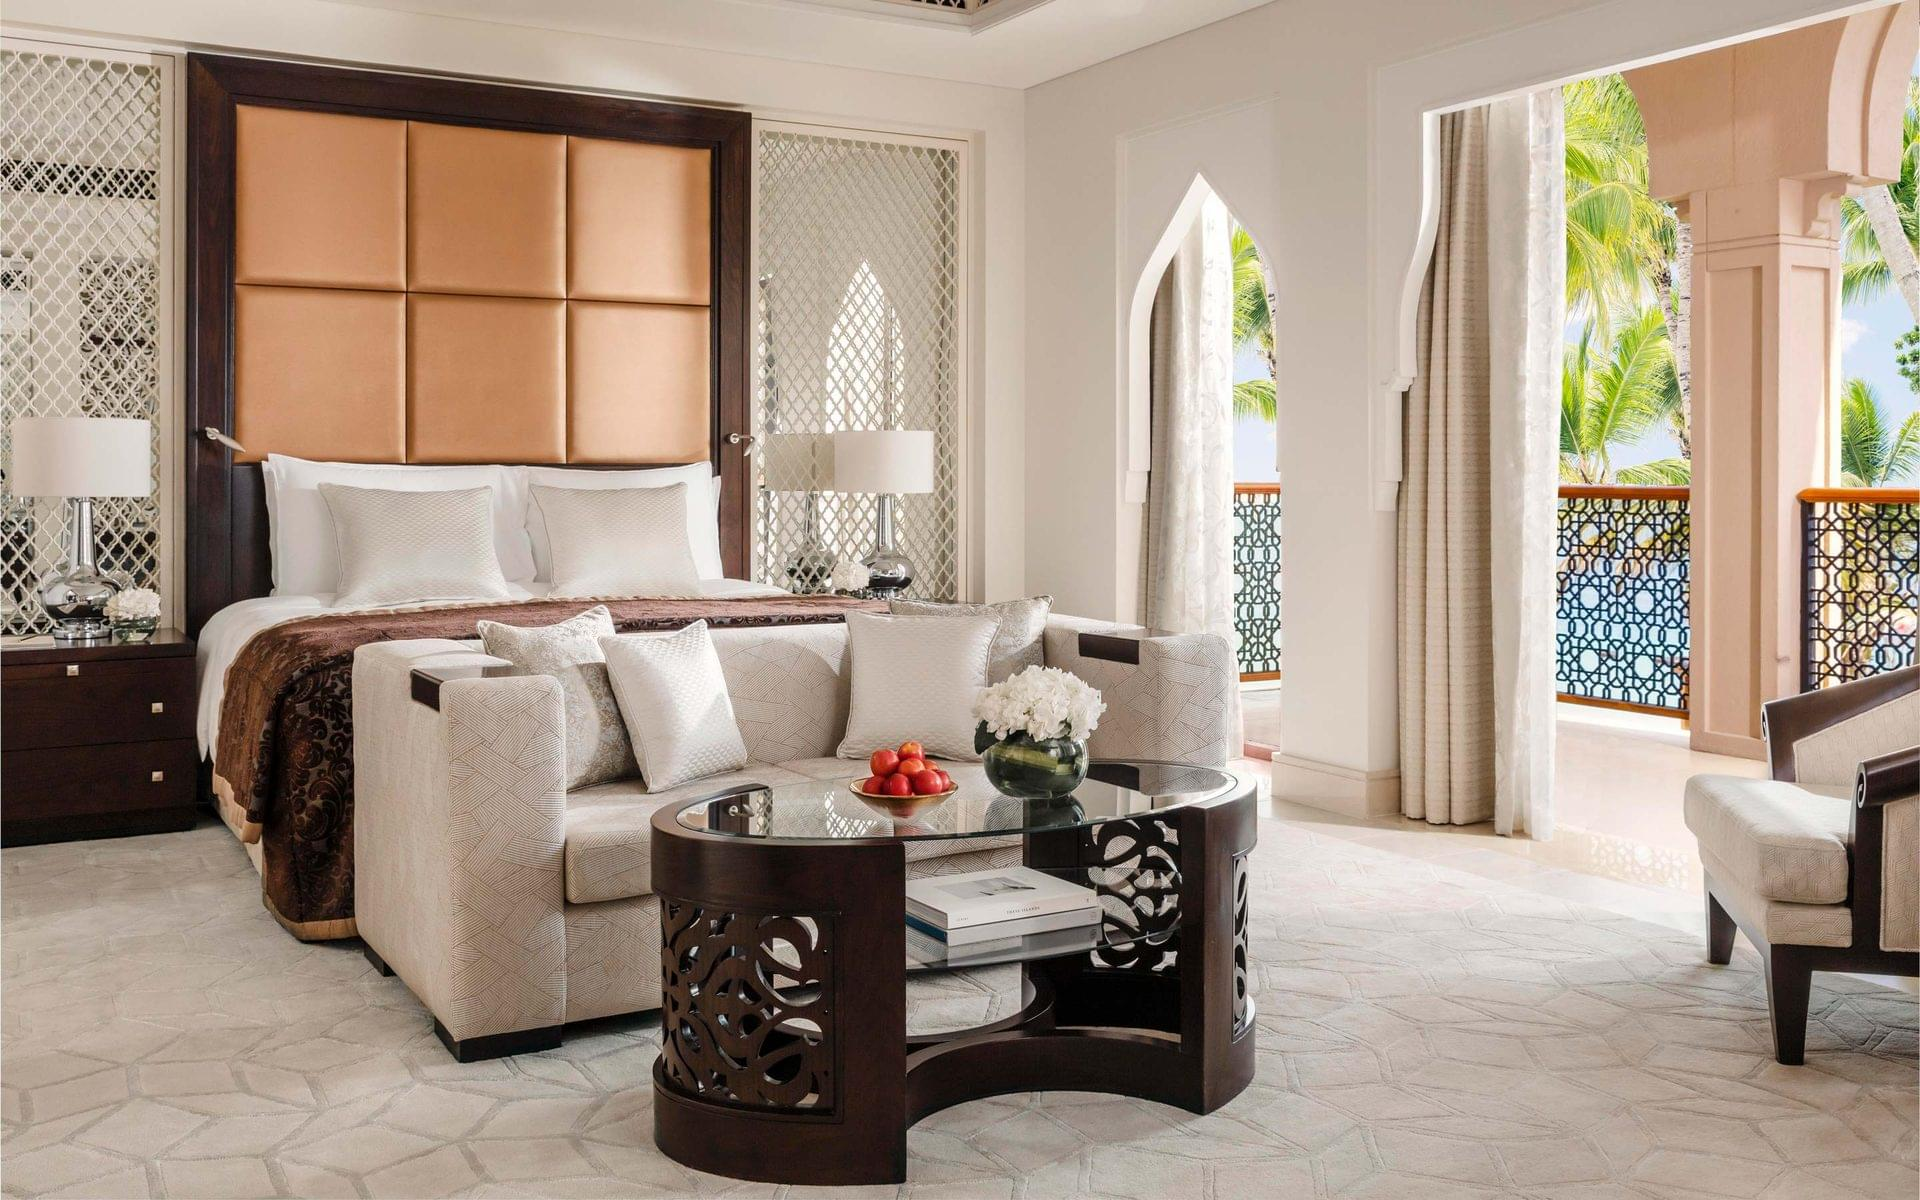 Palm manor house premier room